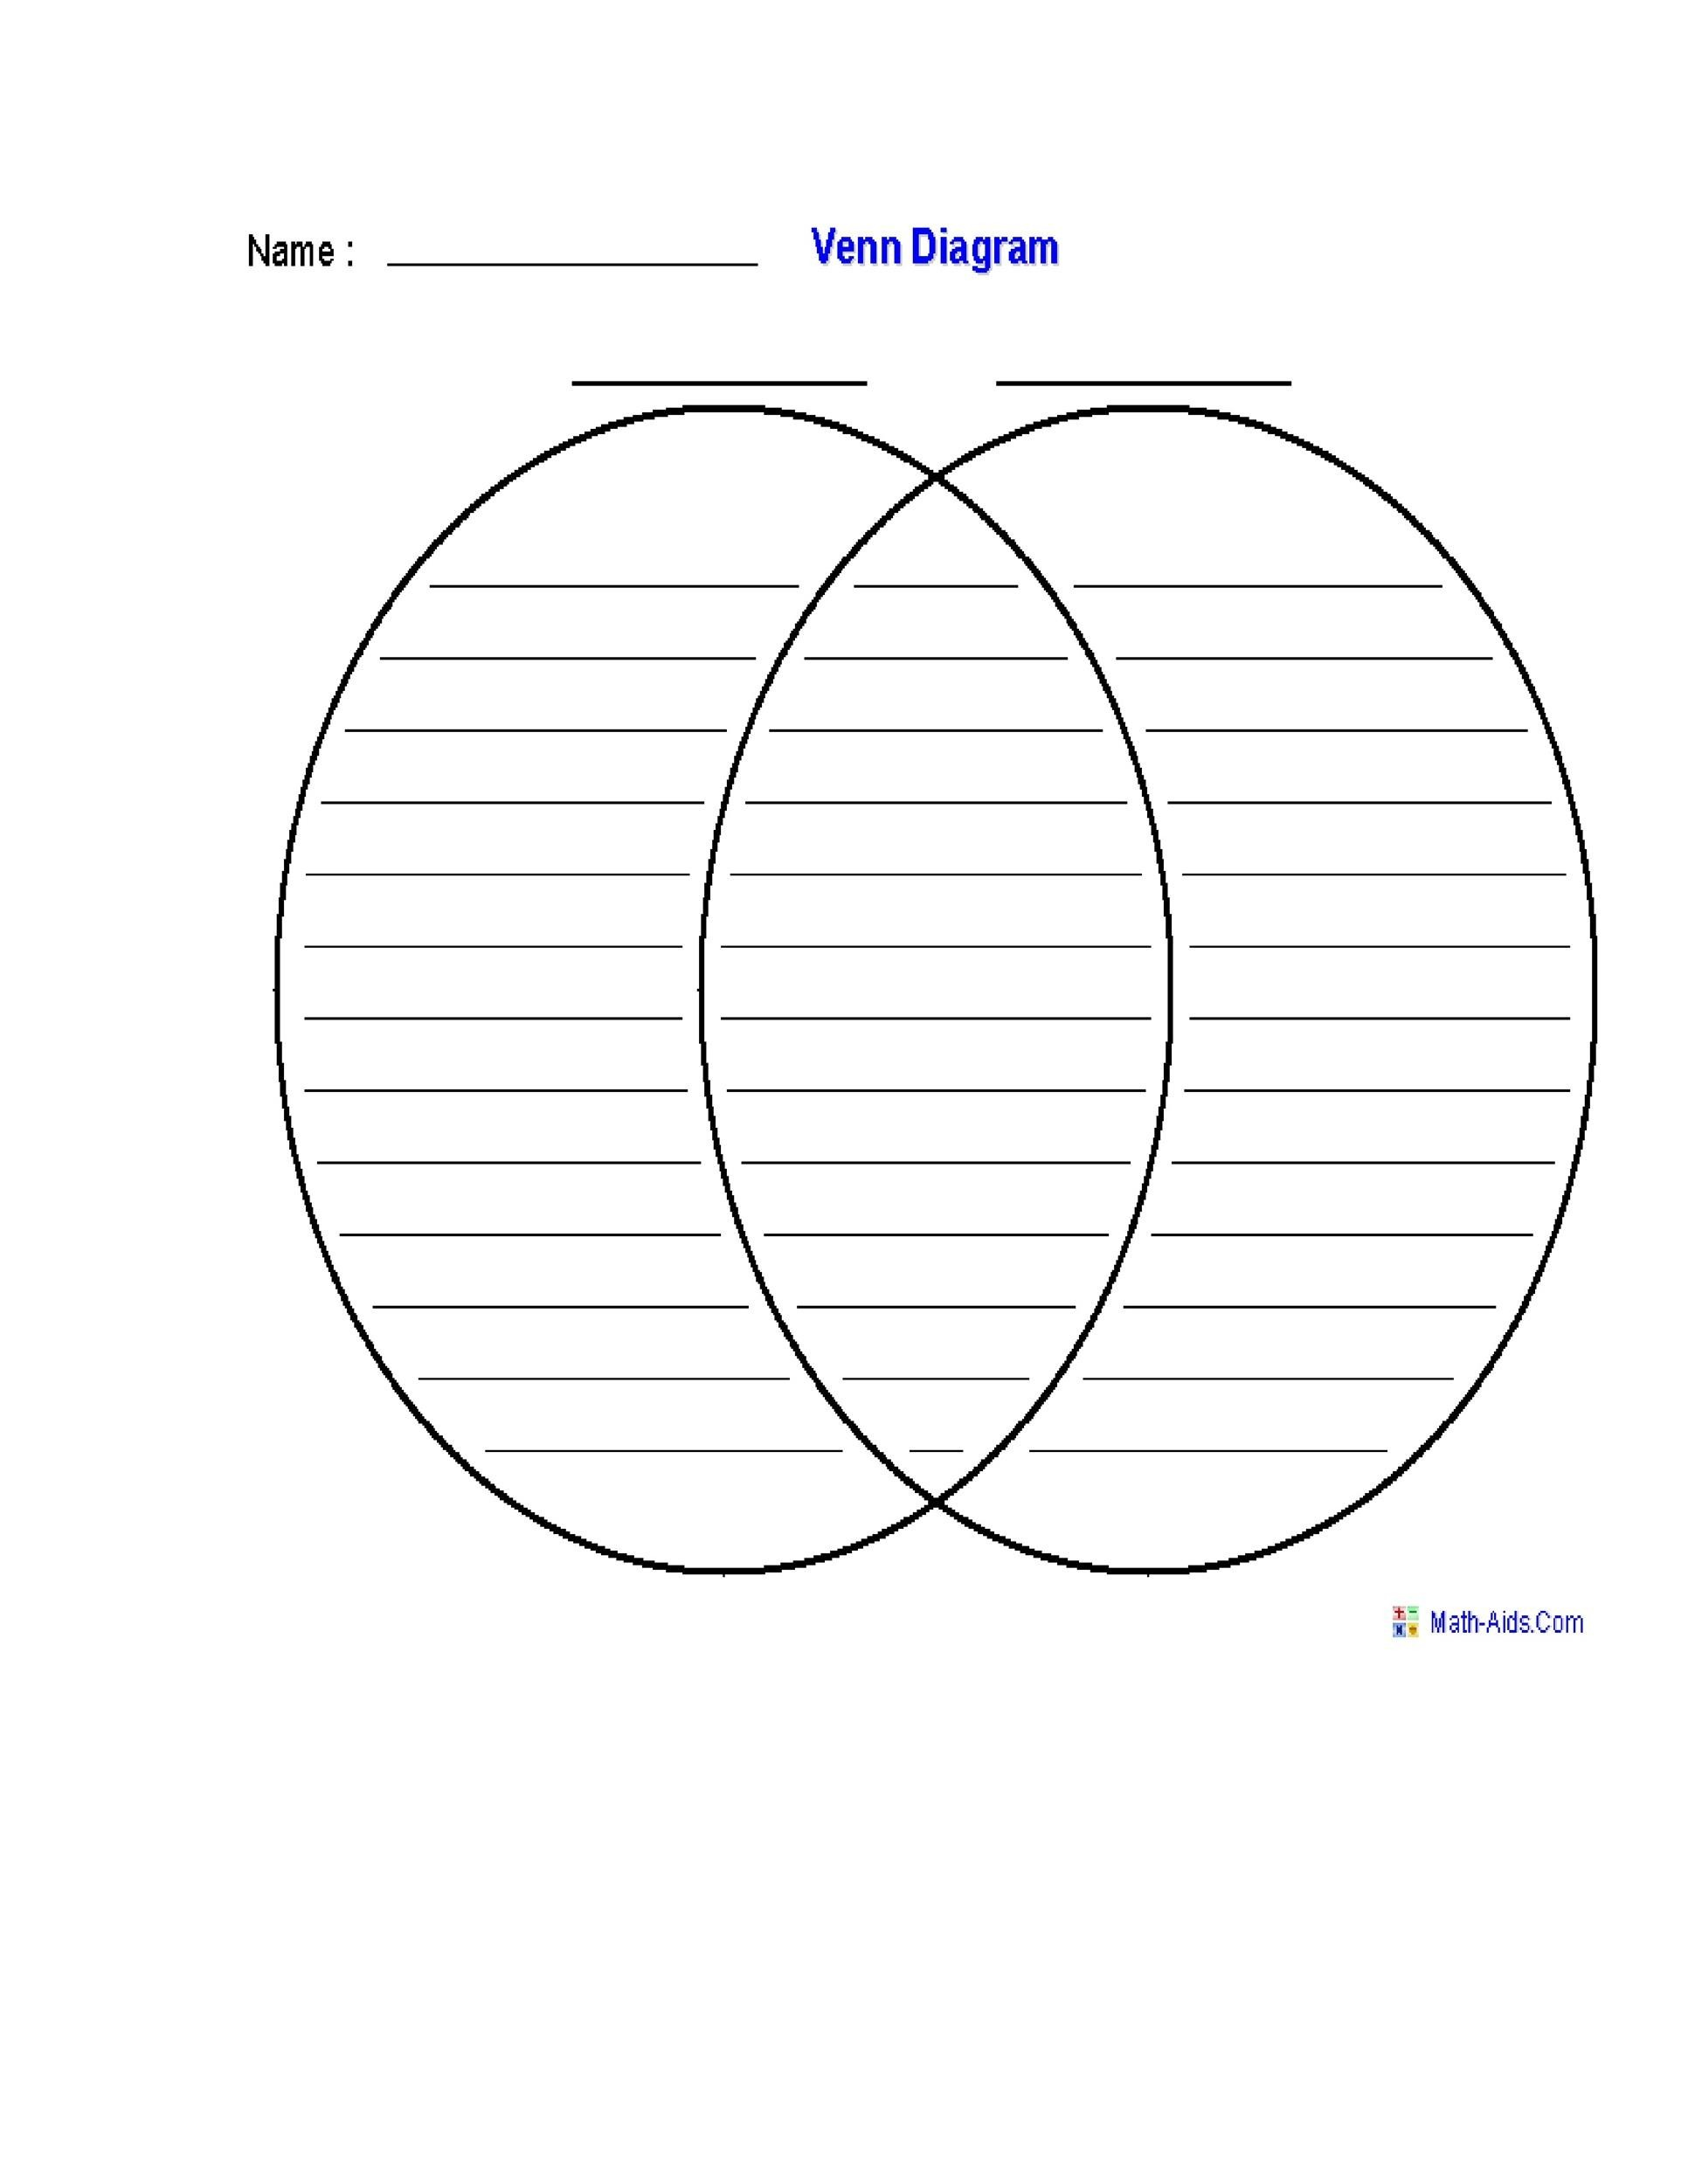 Free venn diagram template 32